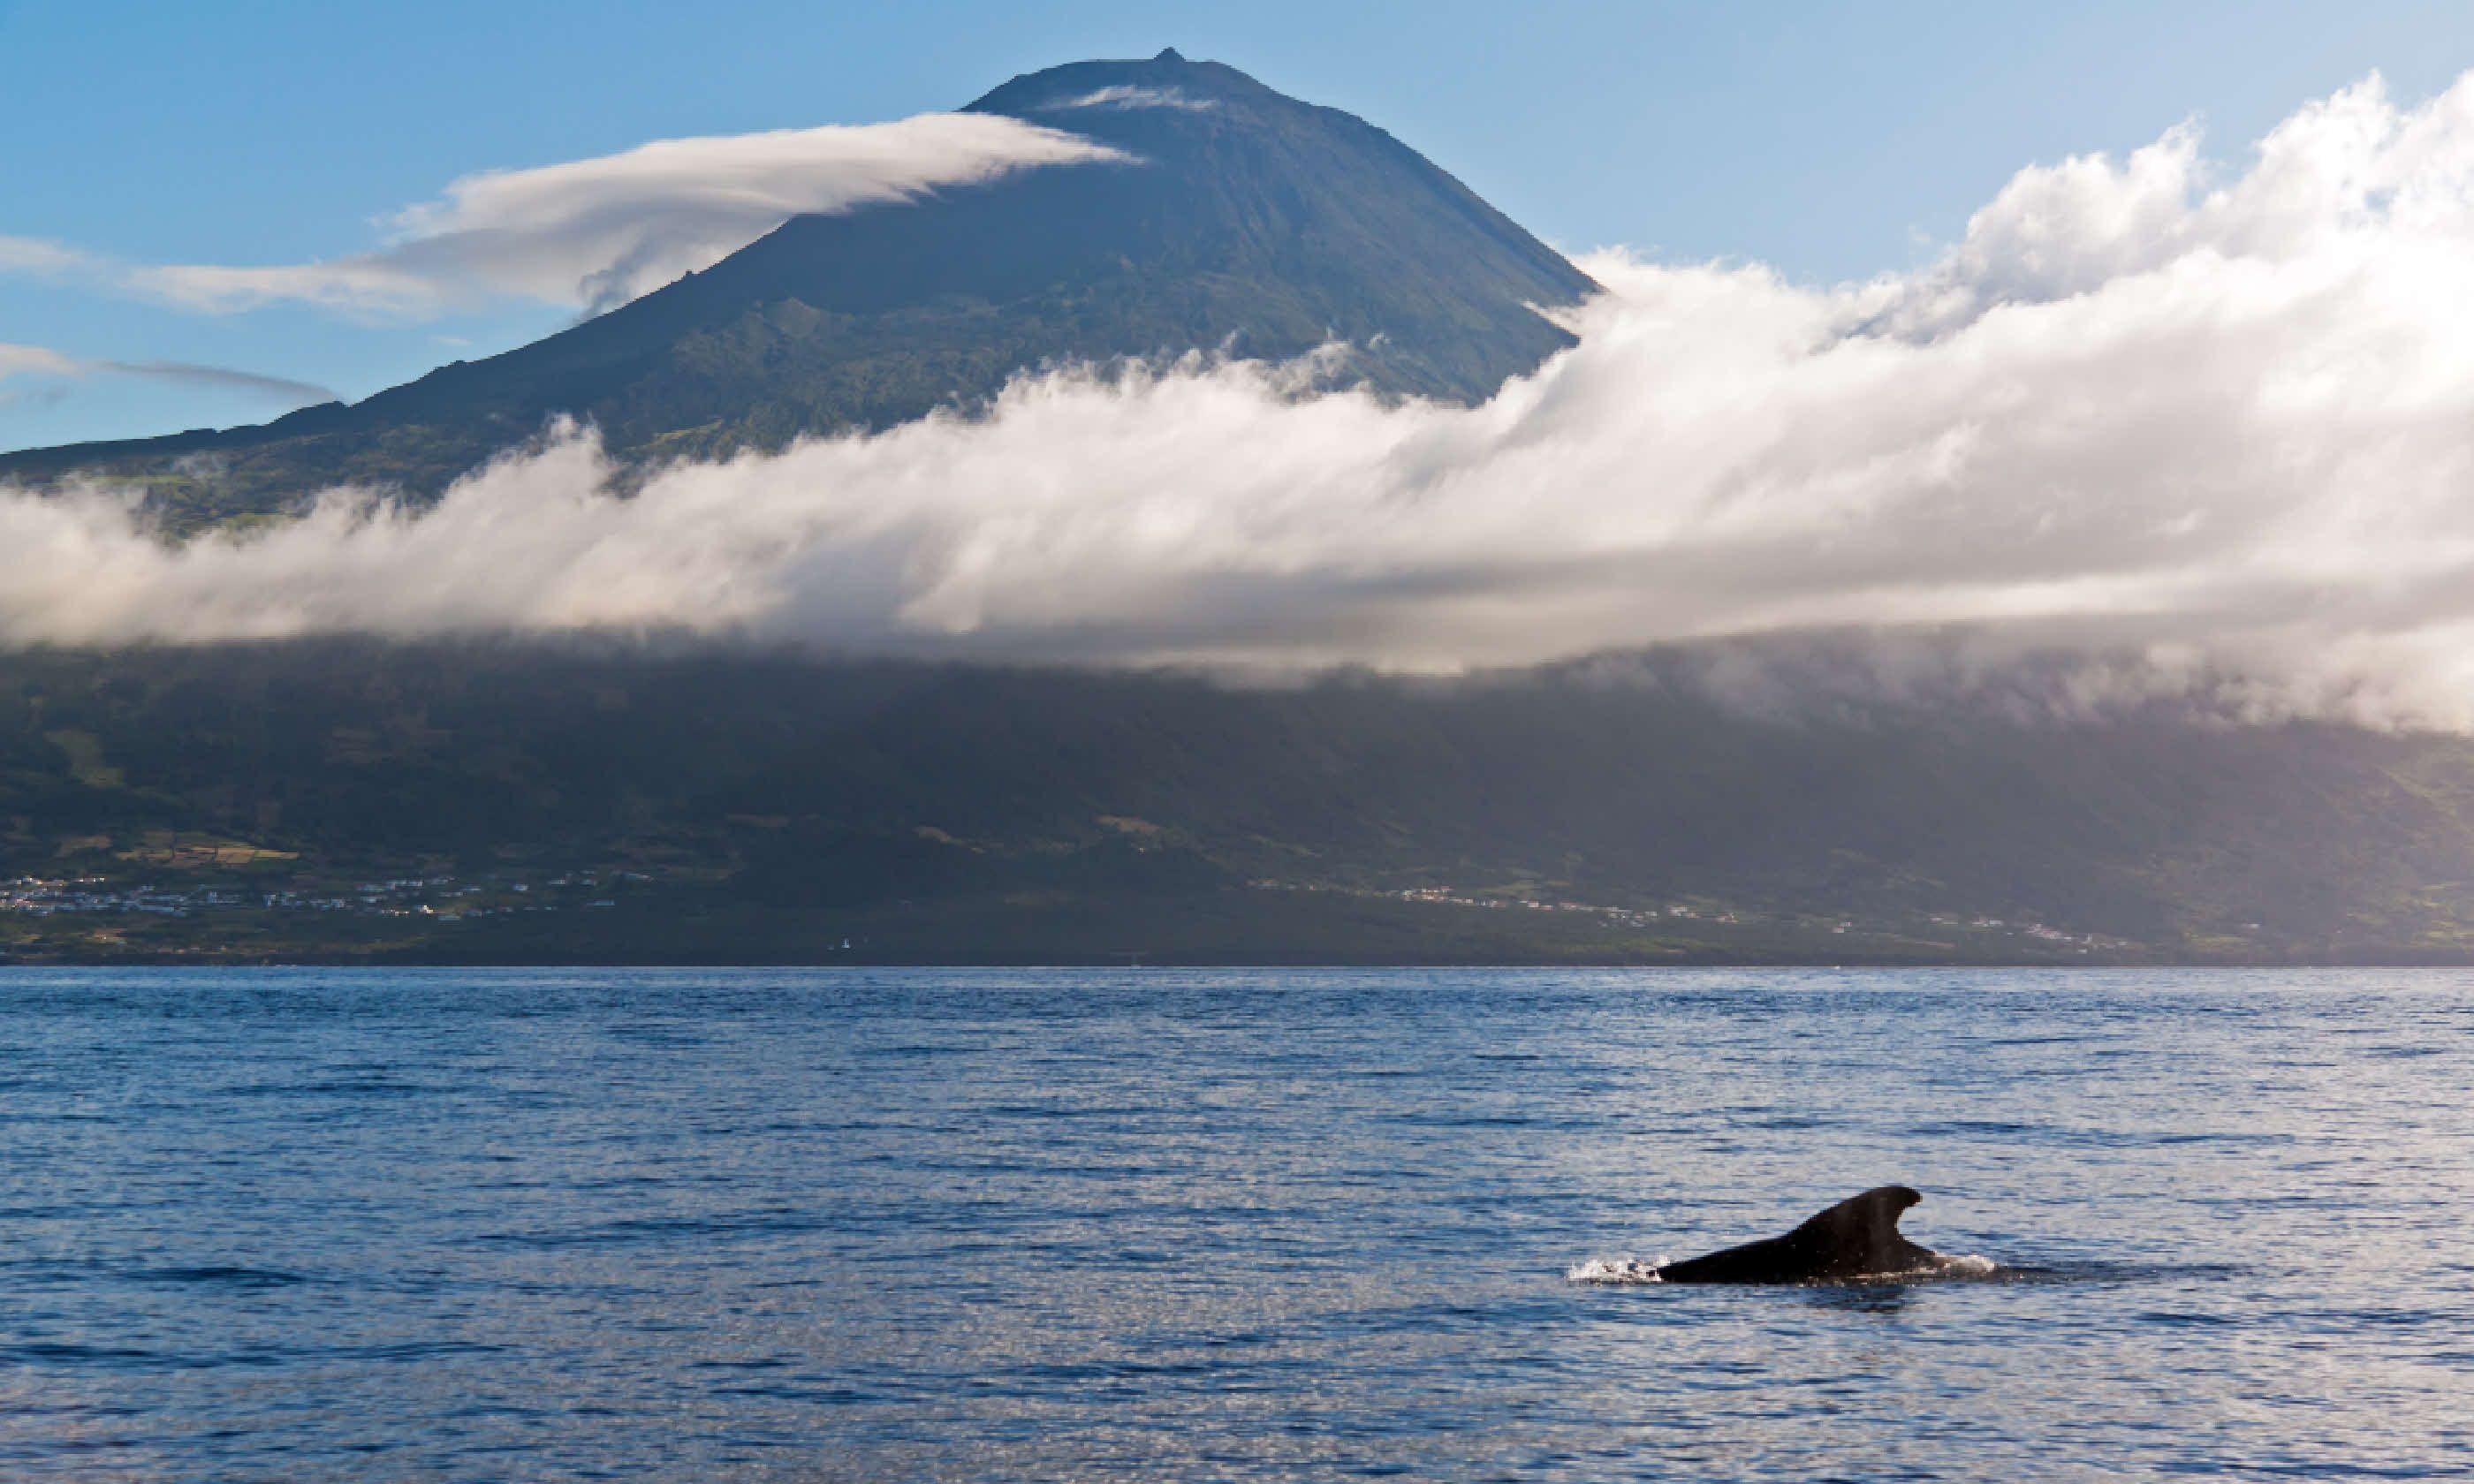 Whale off Pico island (Shutterstock)